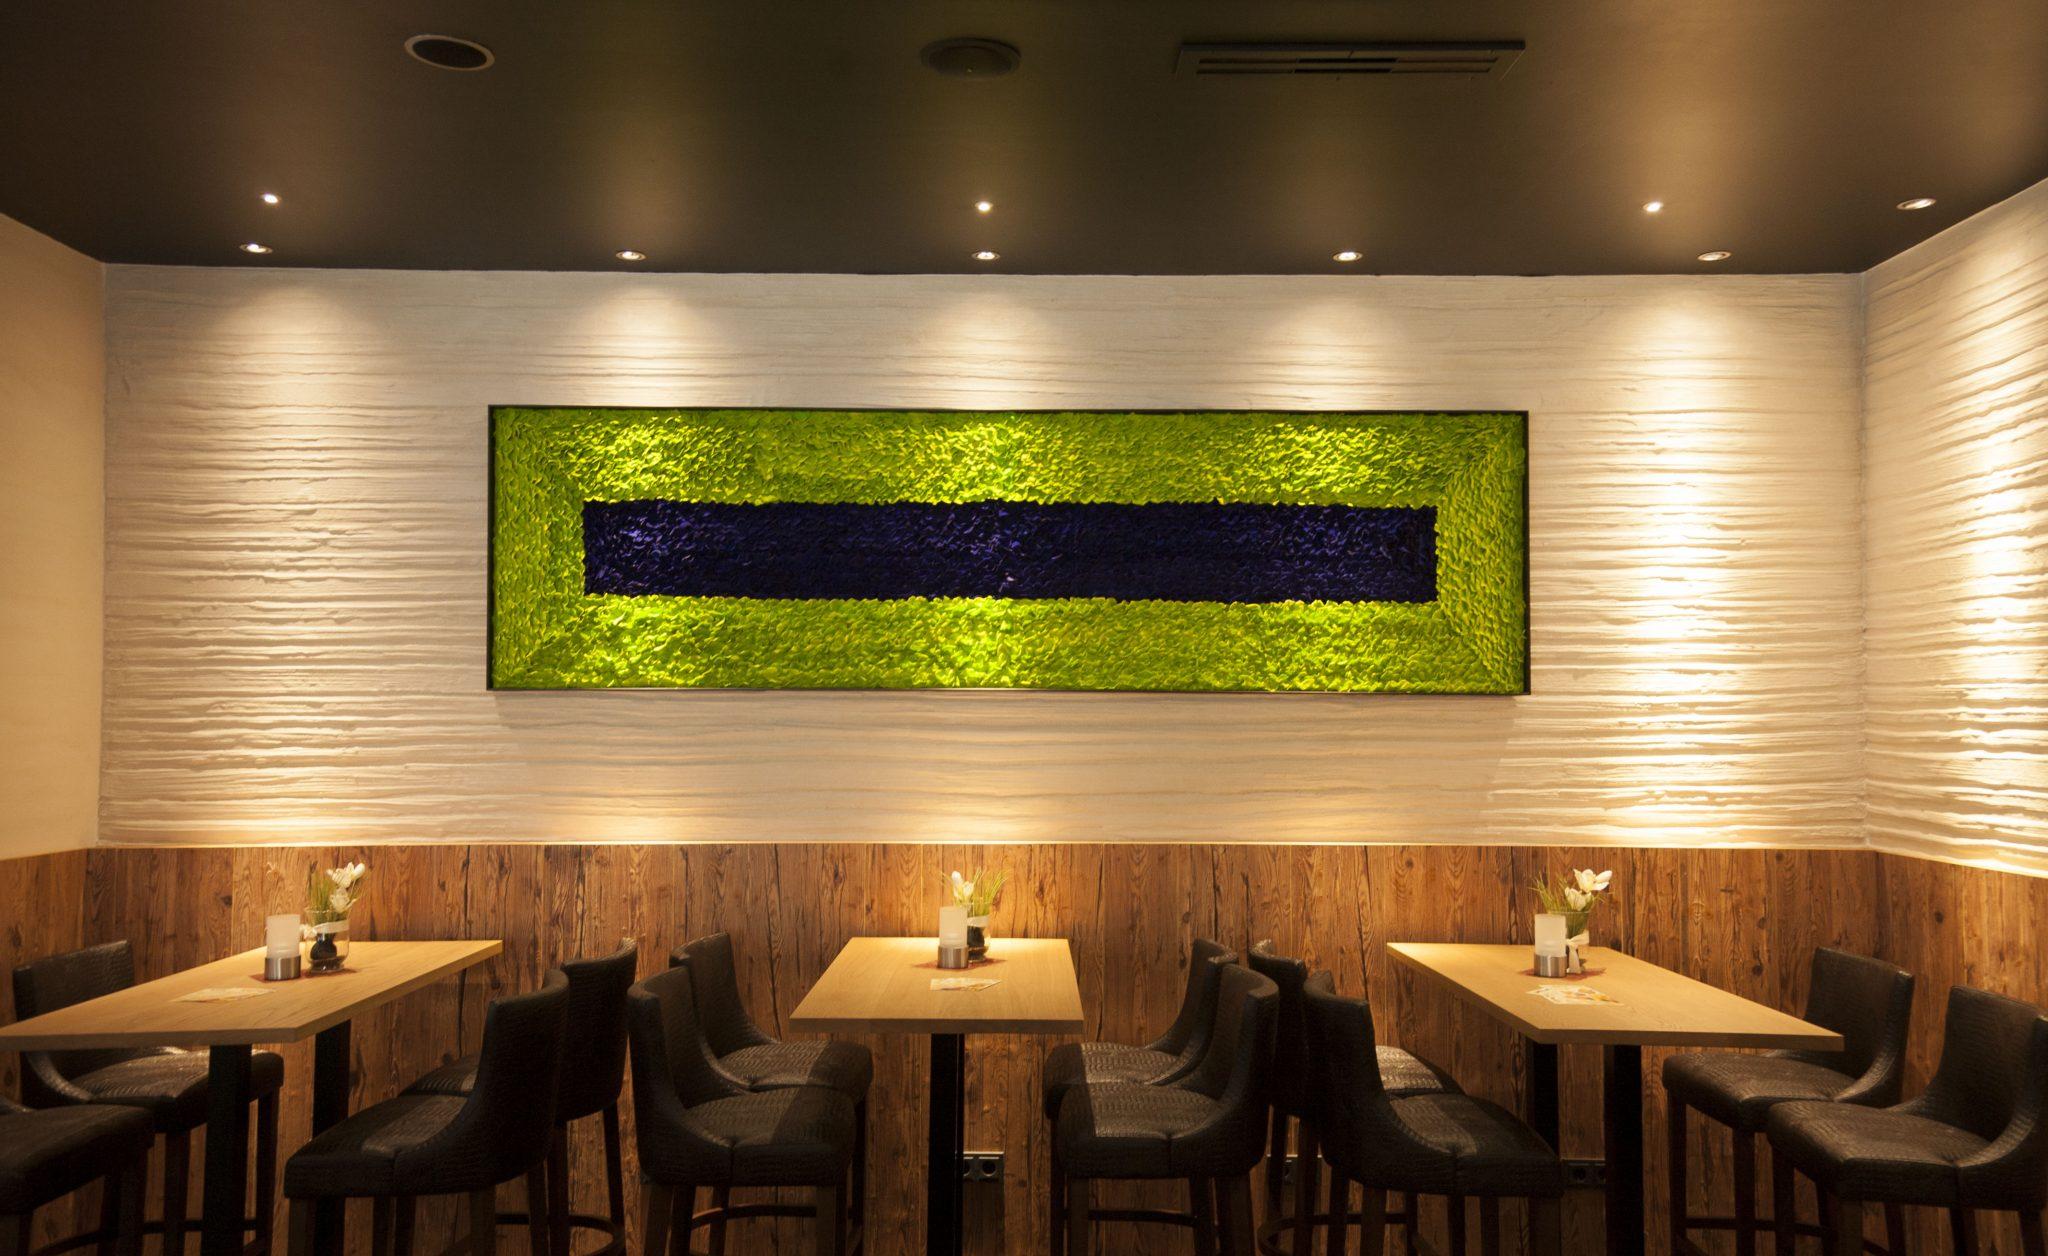 Rosenpaneel blau-grün im Restaurant Filmpalast Admiral